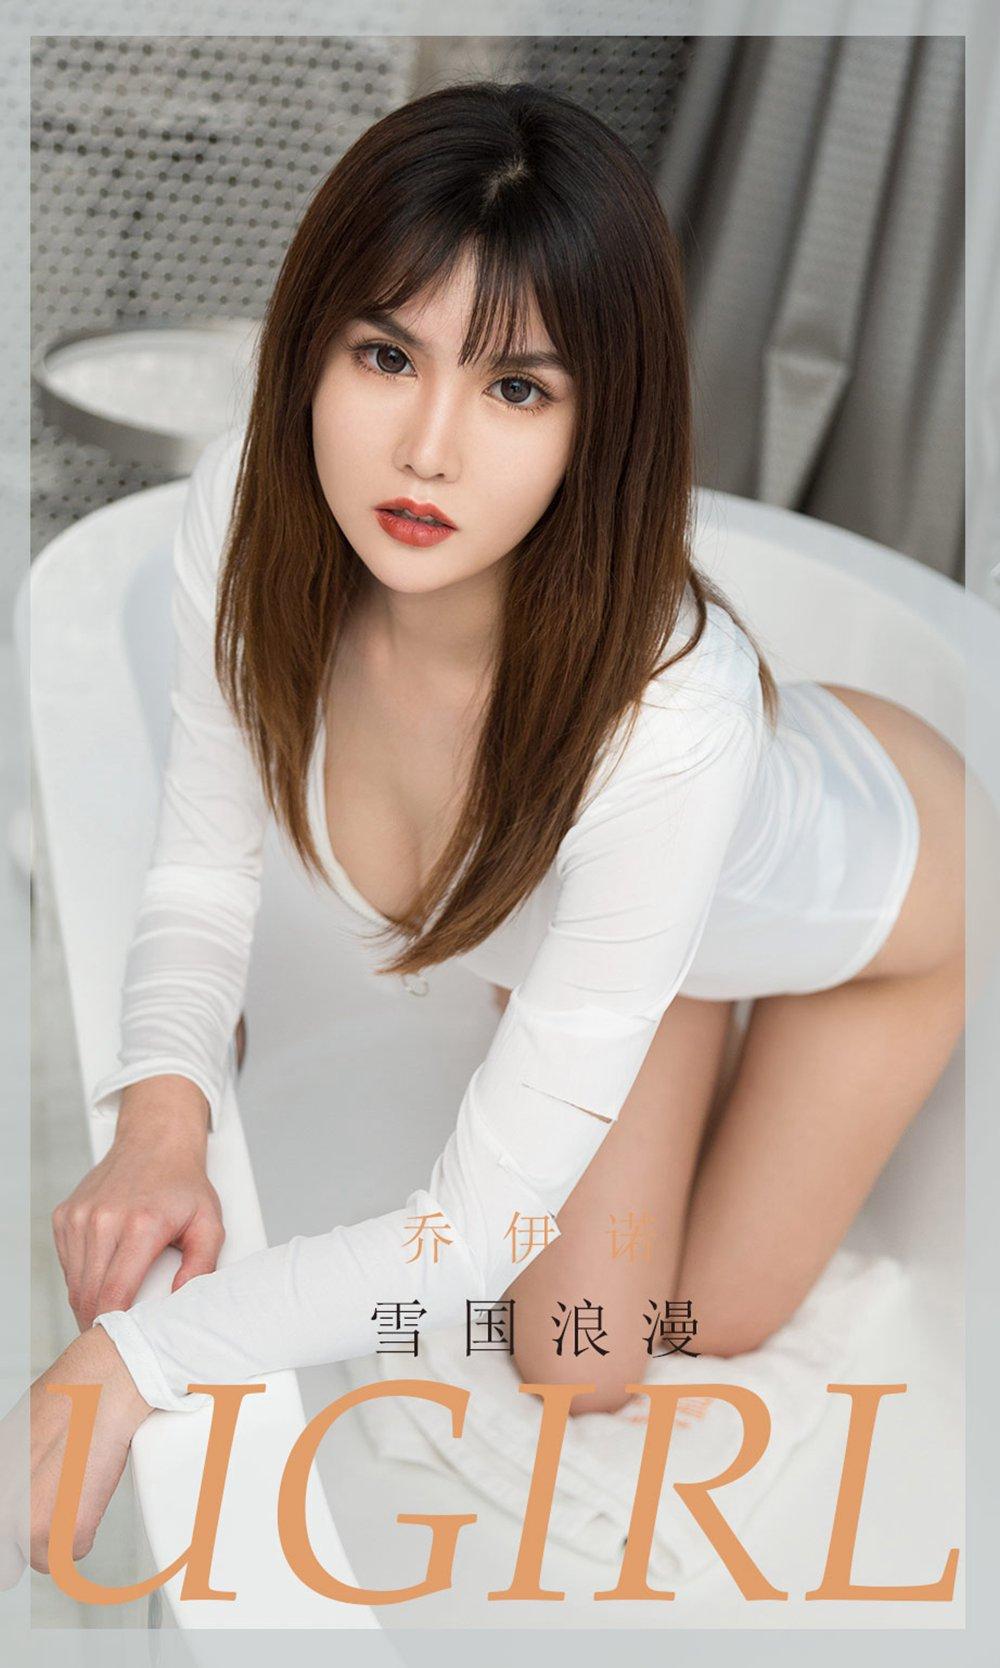 [Ugirls尤果网]爱尤物专辑 2020.04.30 No.1807 乔依诺 雪国浪漫 [35P] -第1张